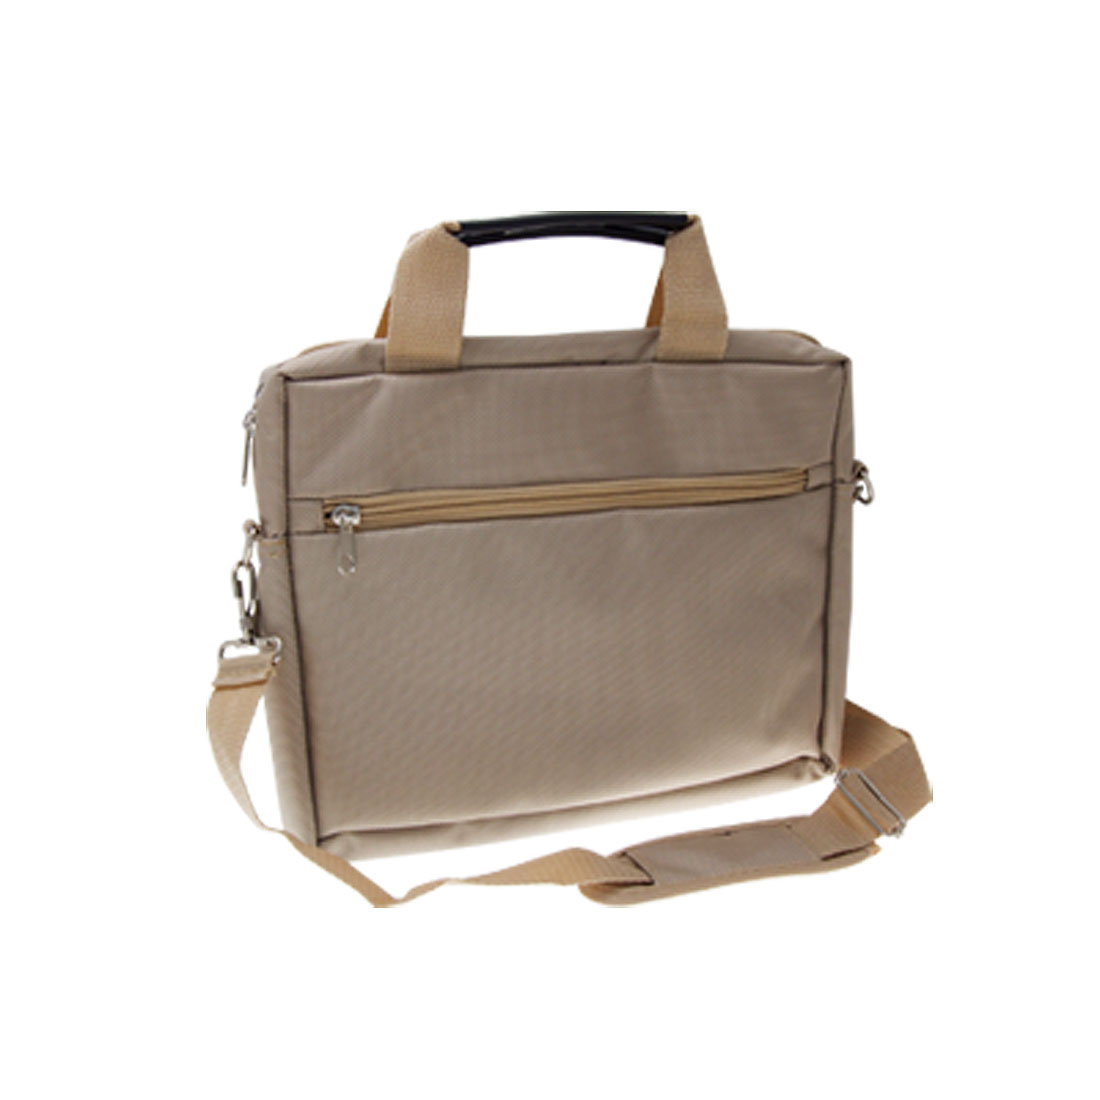 "10"" 10.1"" 10.2"" Khaki Notebook Laptop Shoulder Bag Carrying Case"